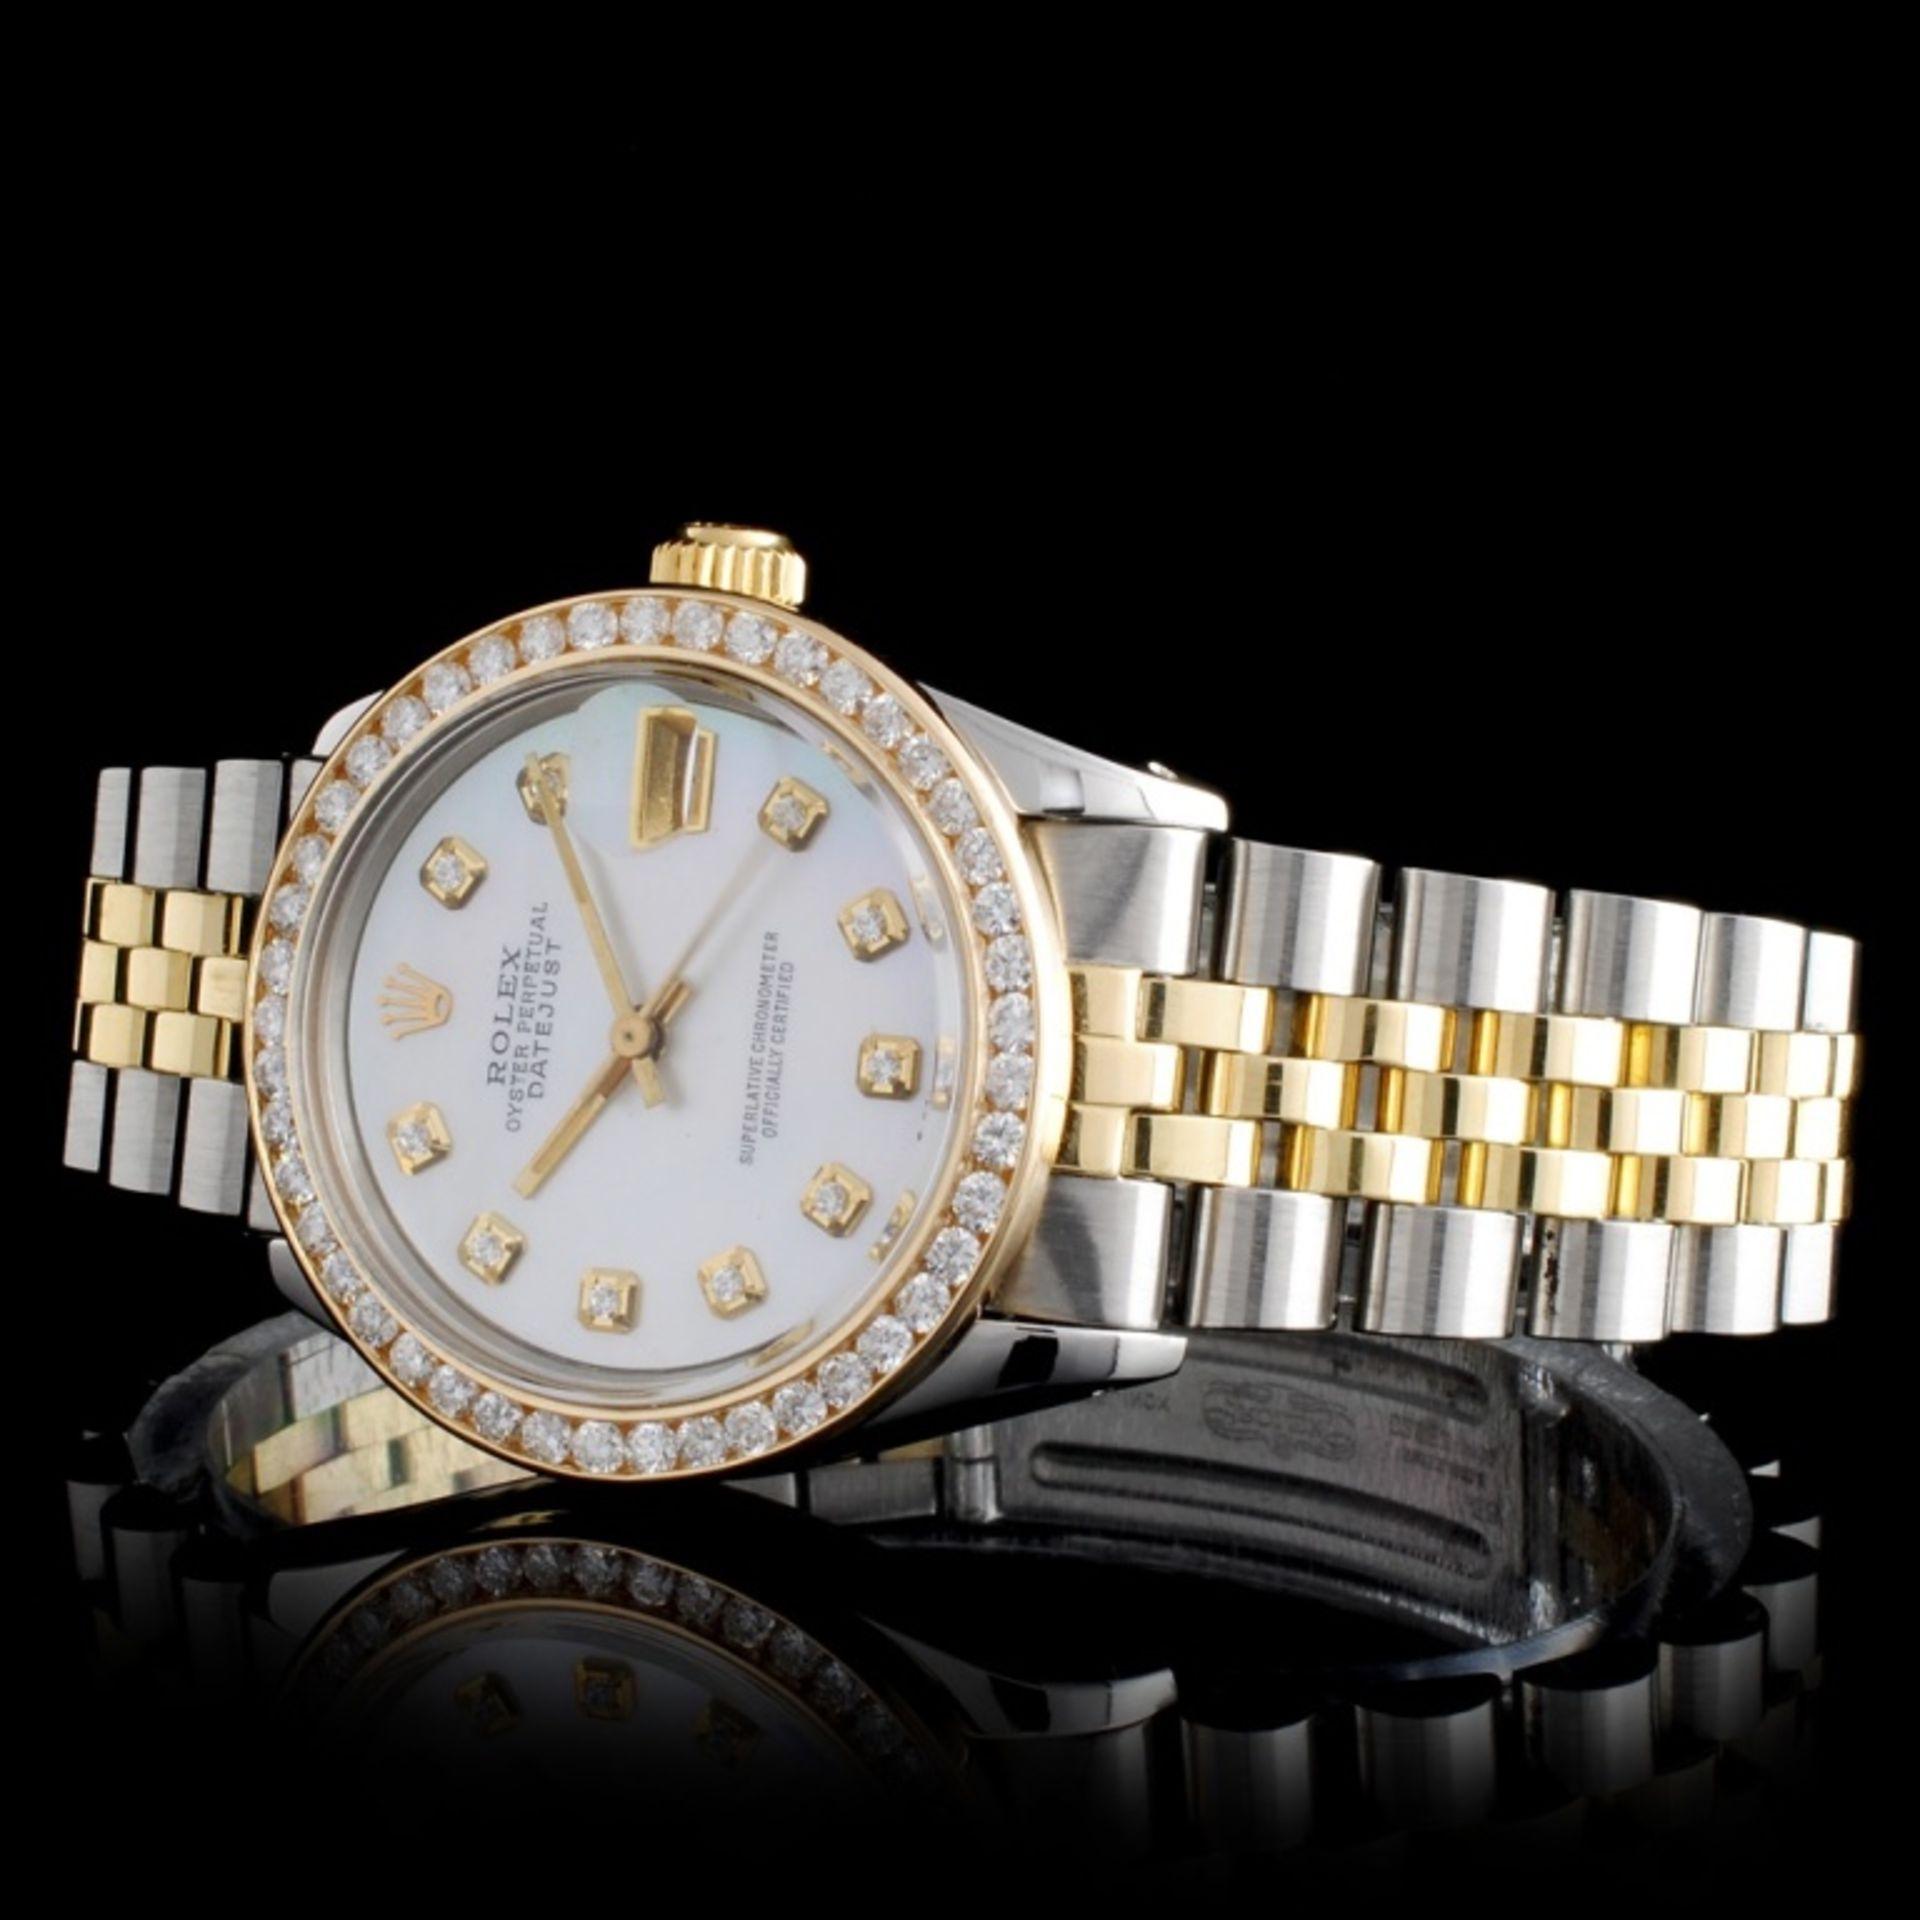 Rolex DateJust Diamond 31mm Wristwatch - Image 2 of 5